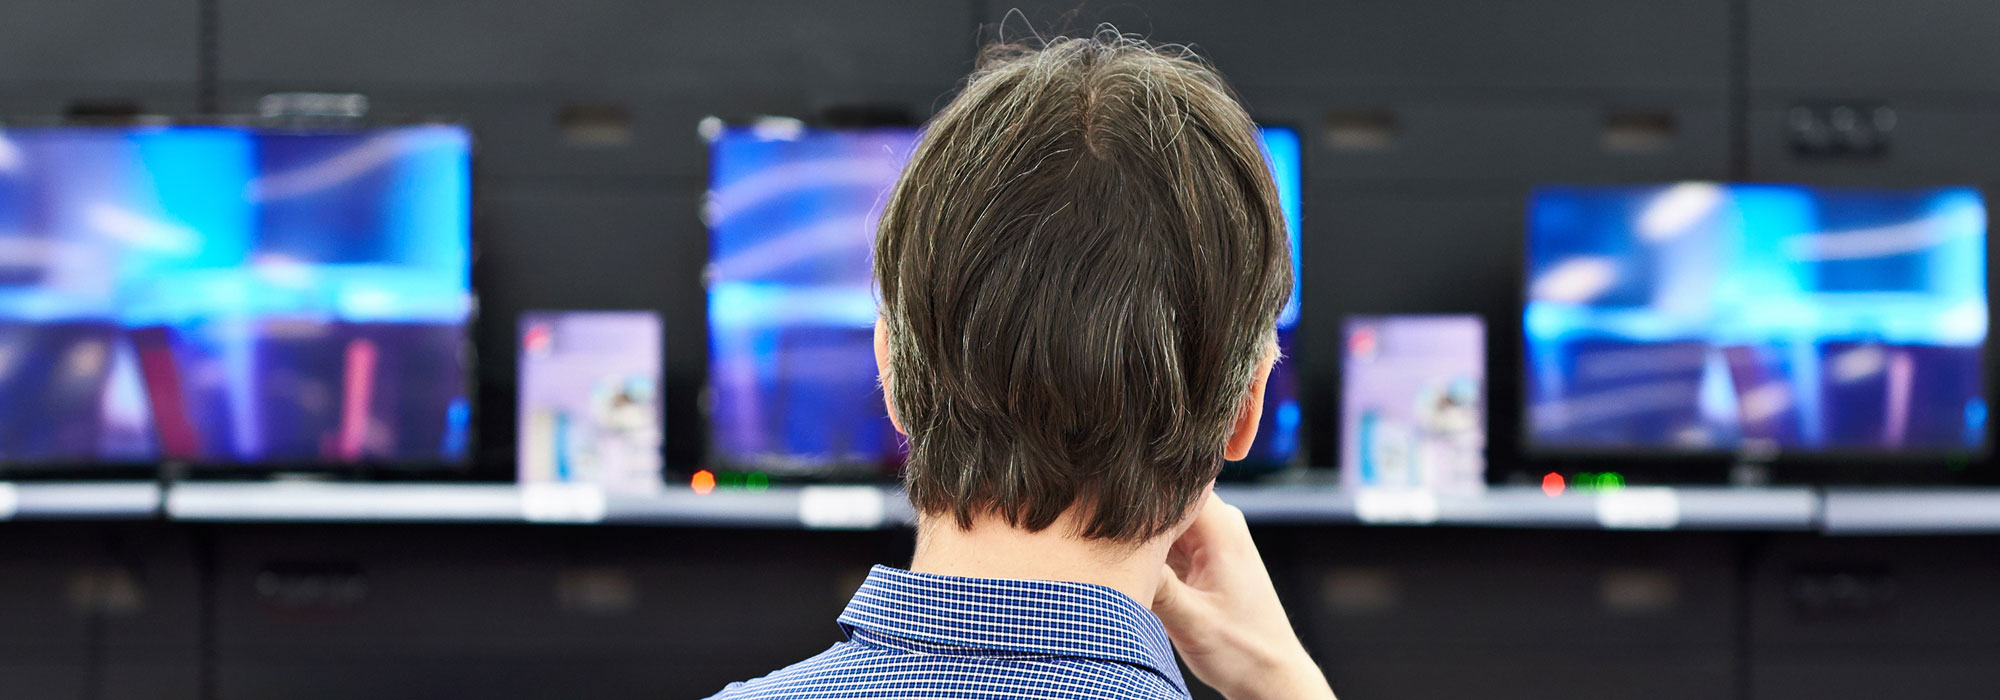 man deciding on TVs